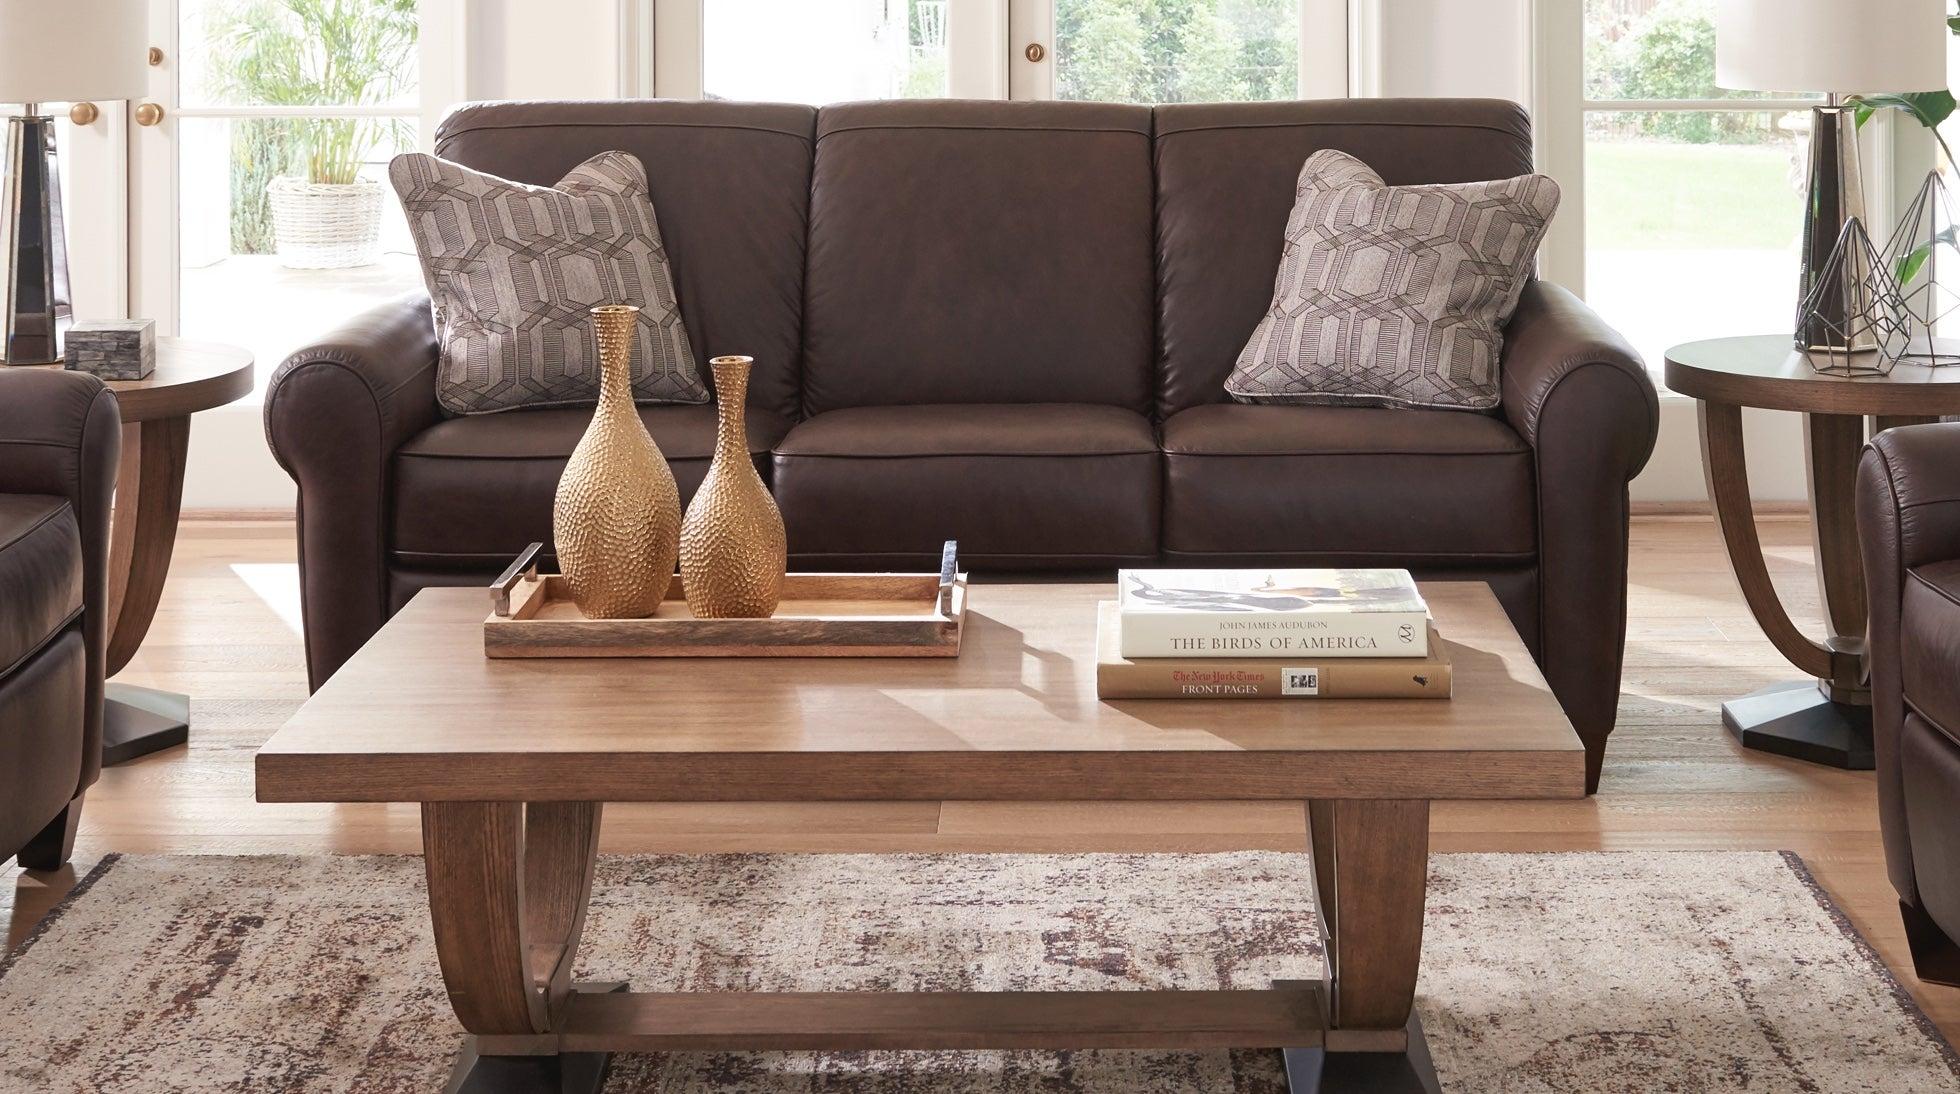 Enjoyable Duo Reclining Sofa Duo Duo La Z Boy Inc Sofas Makenna Duo Evergreenethics Interior Chair Design Evergreenethicsorg